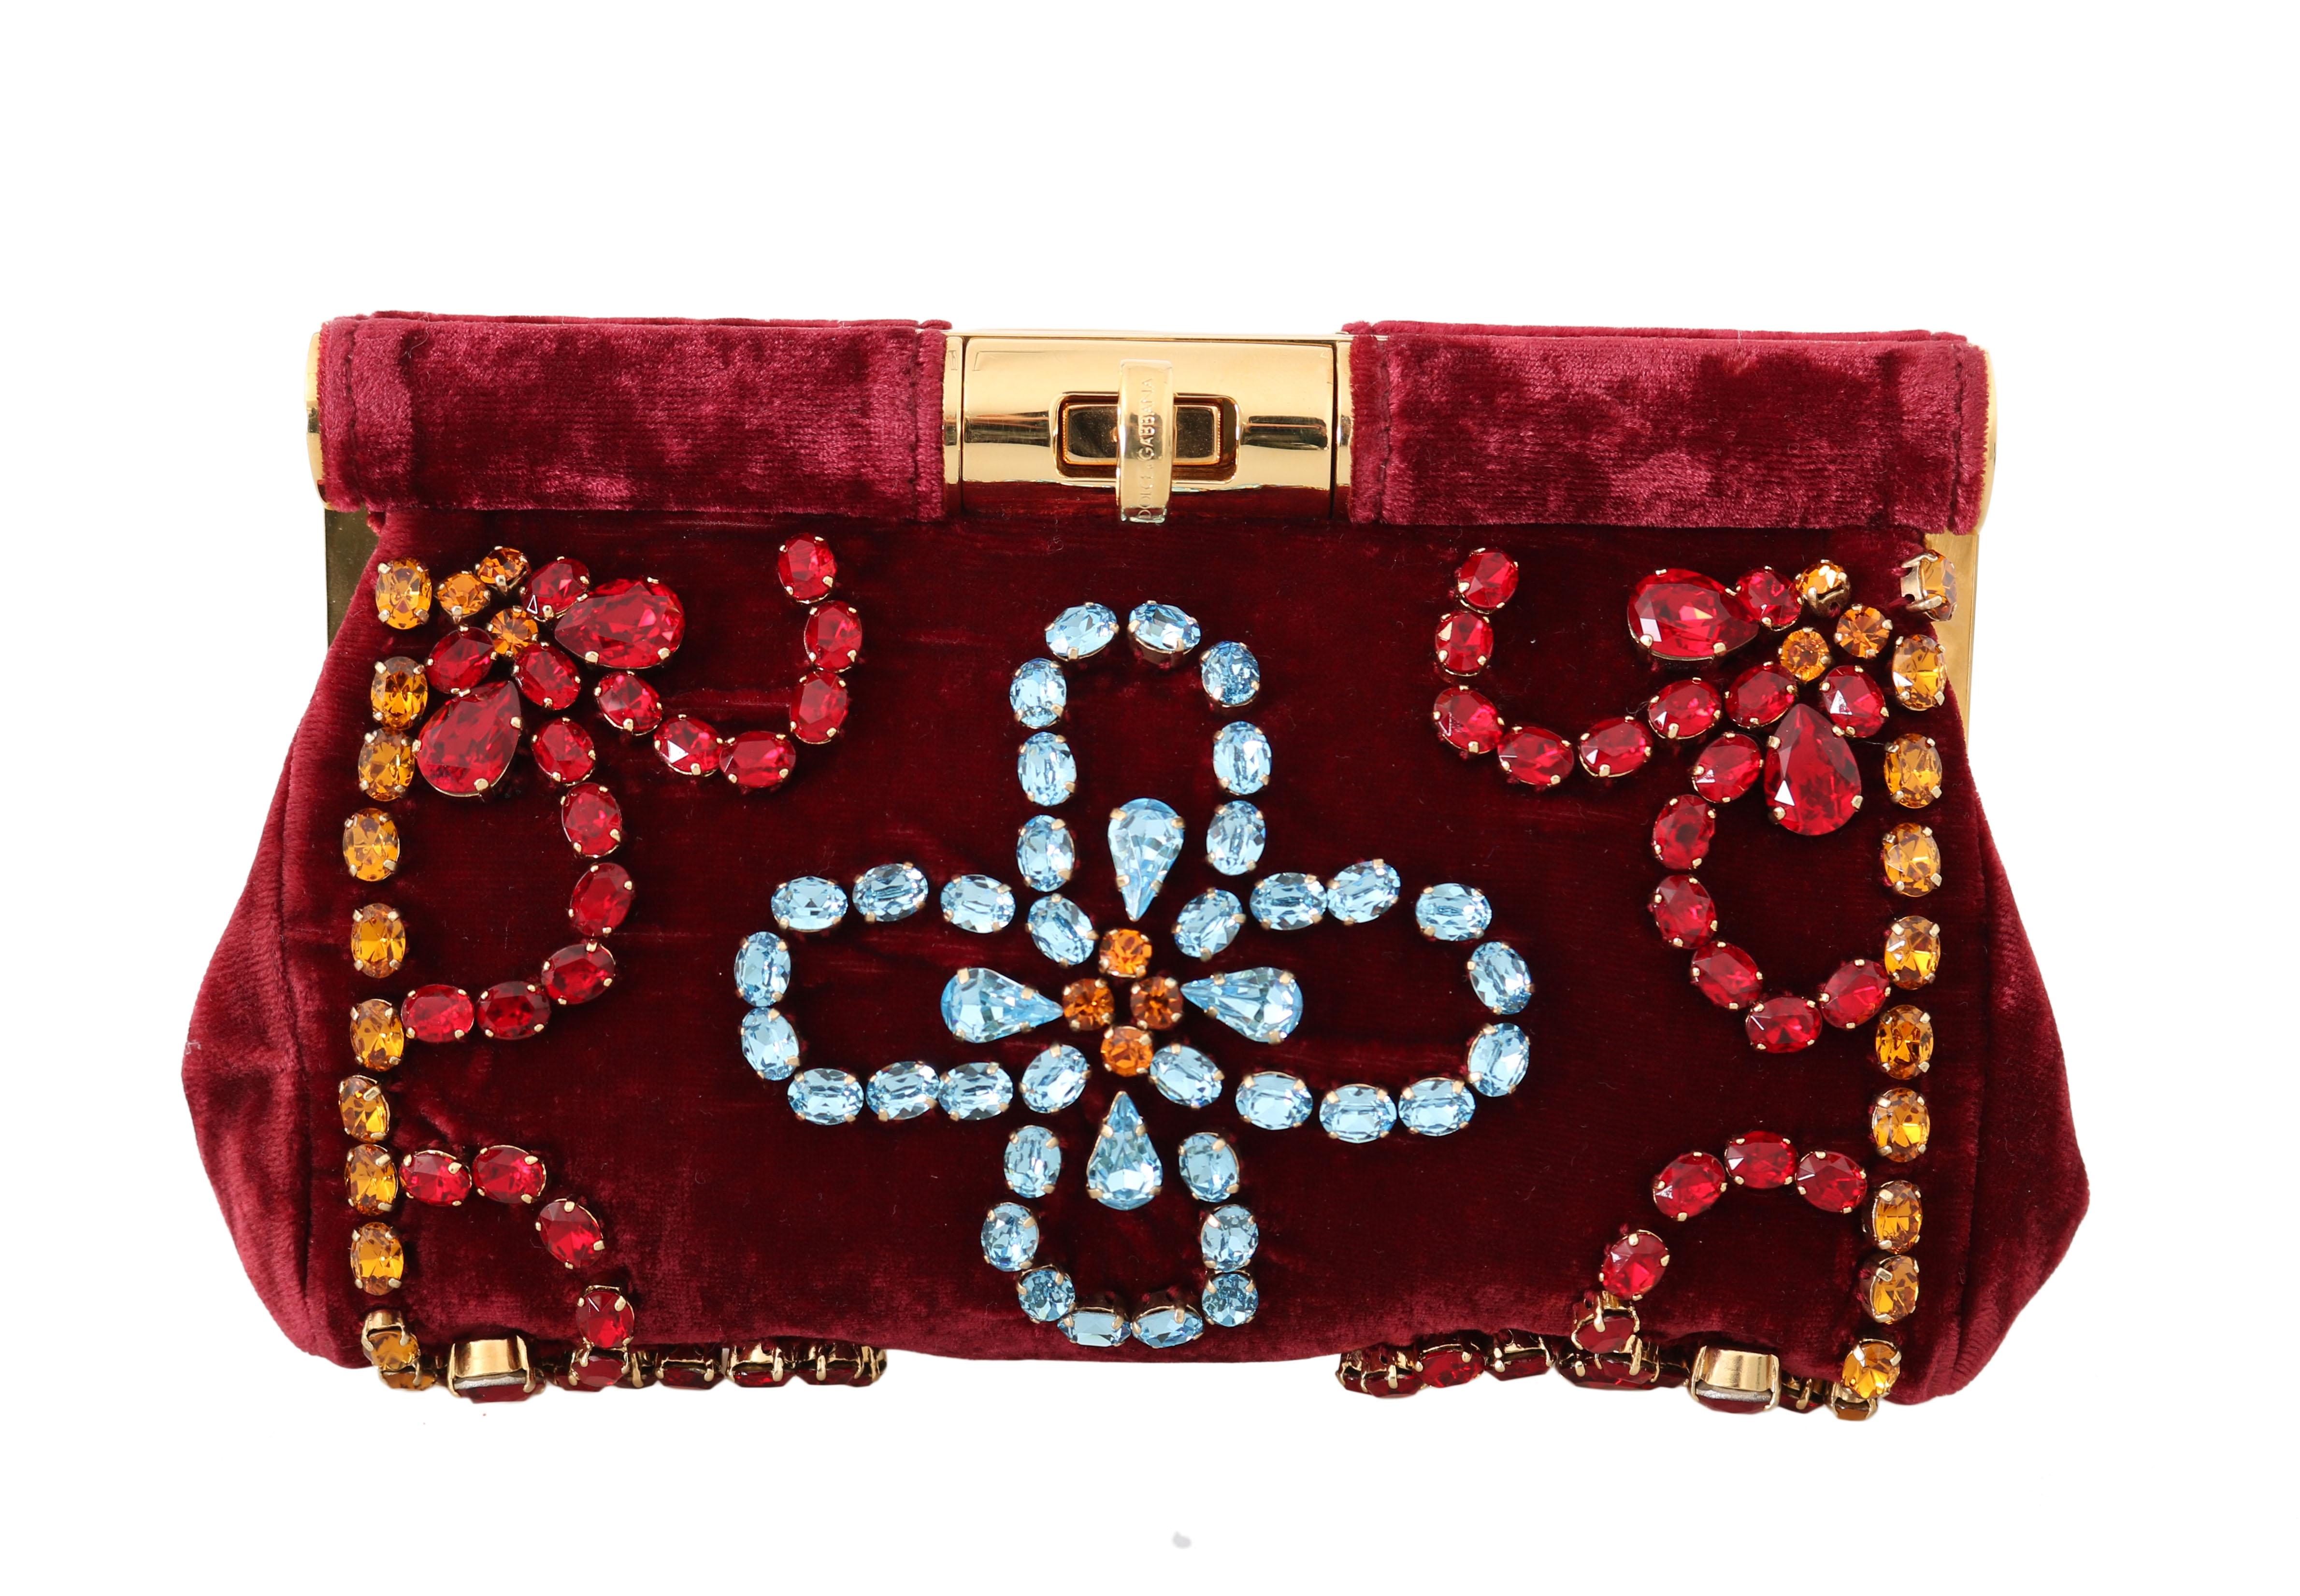 Dolce & Gabbana Women's Ricamo Crystal Party Clutch Bag Red VAS15230